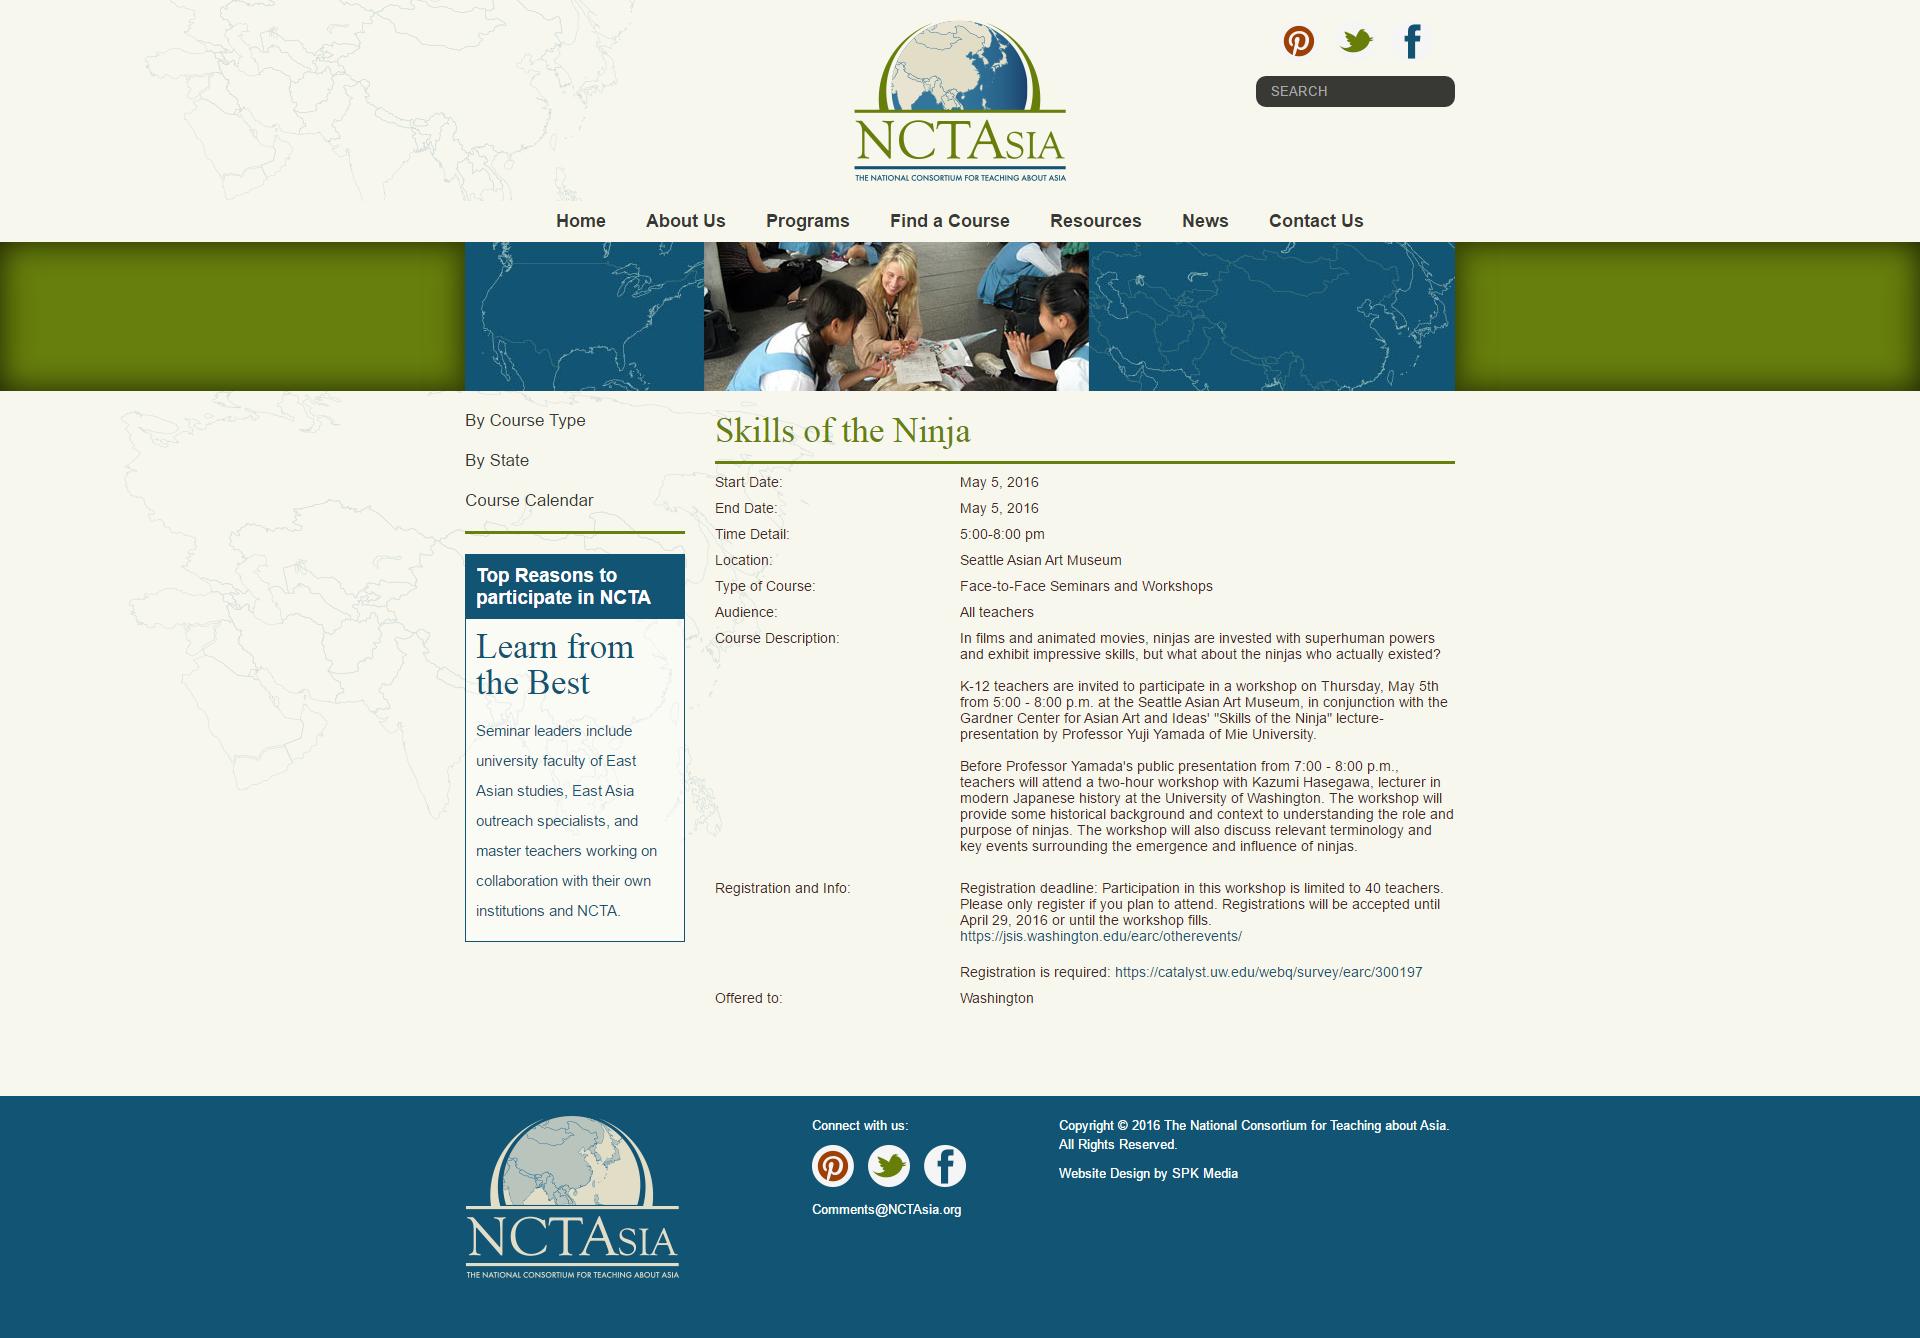 screencapture-nctasia-org-course-skills-of-the-ninja-1461228091230.png